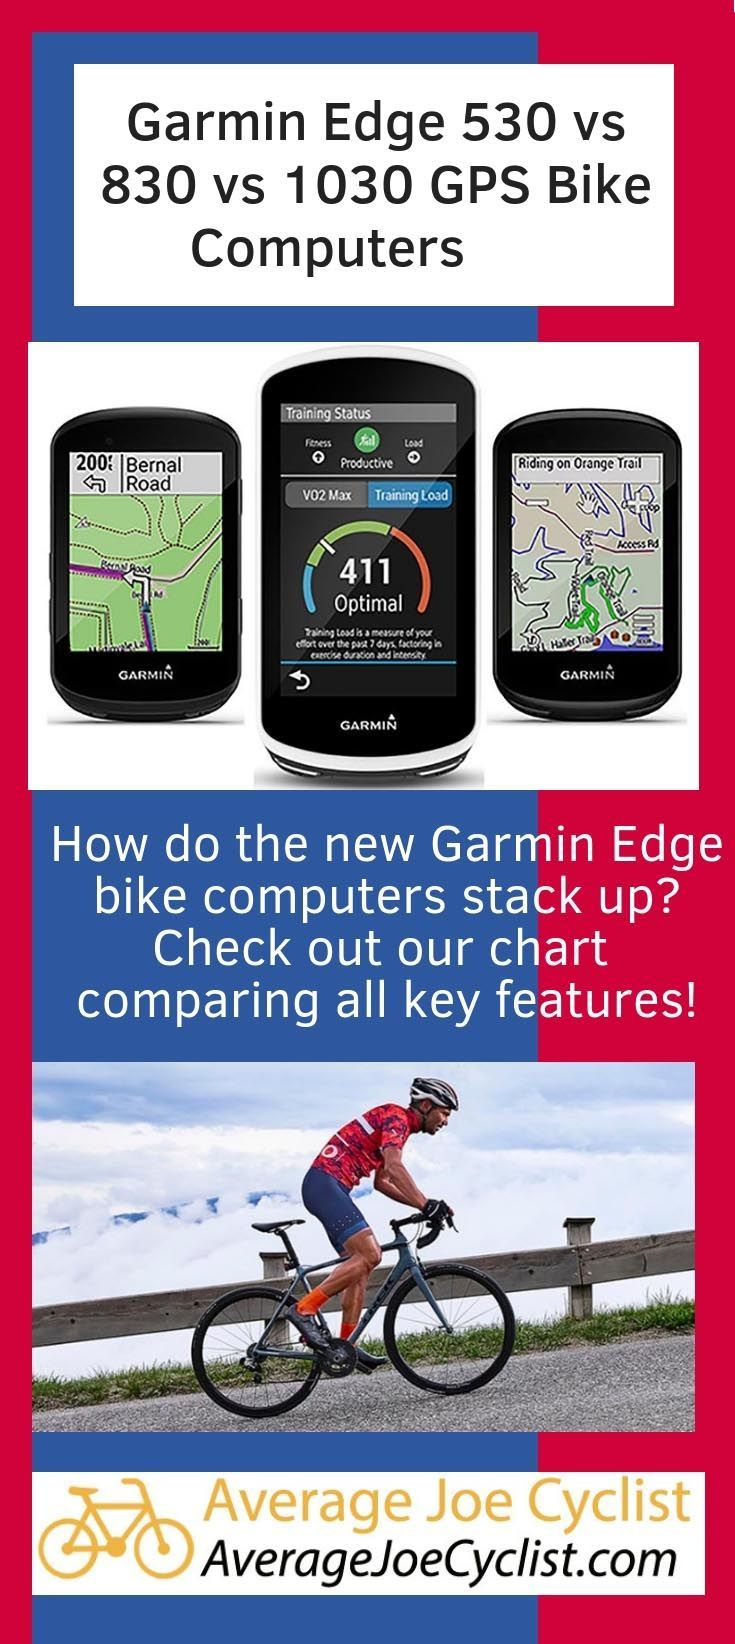 Garmin Edge 530 Vs 830 Vs 1030 Garmin Edge Garmin Cycling Workout